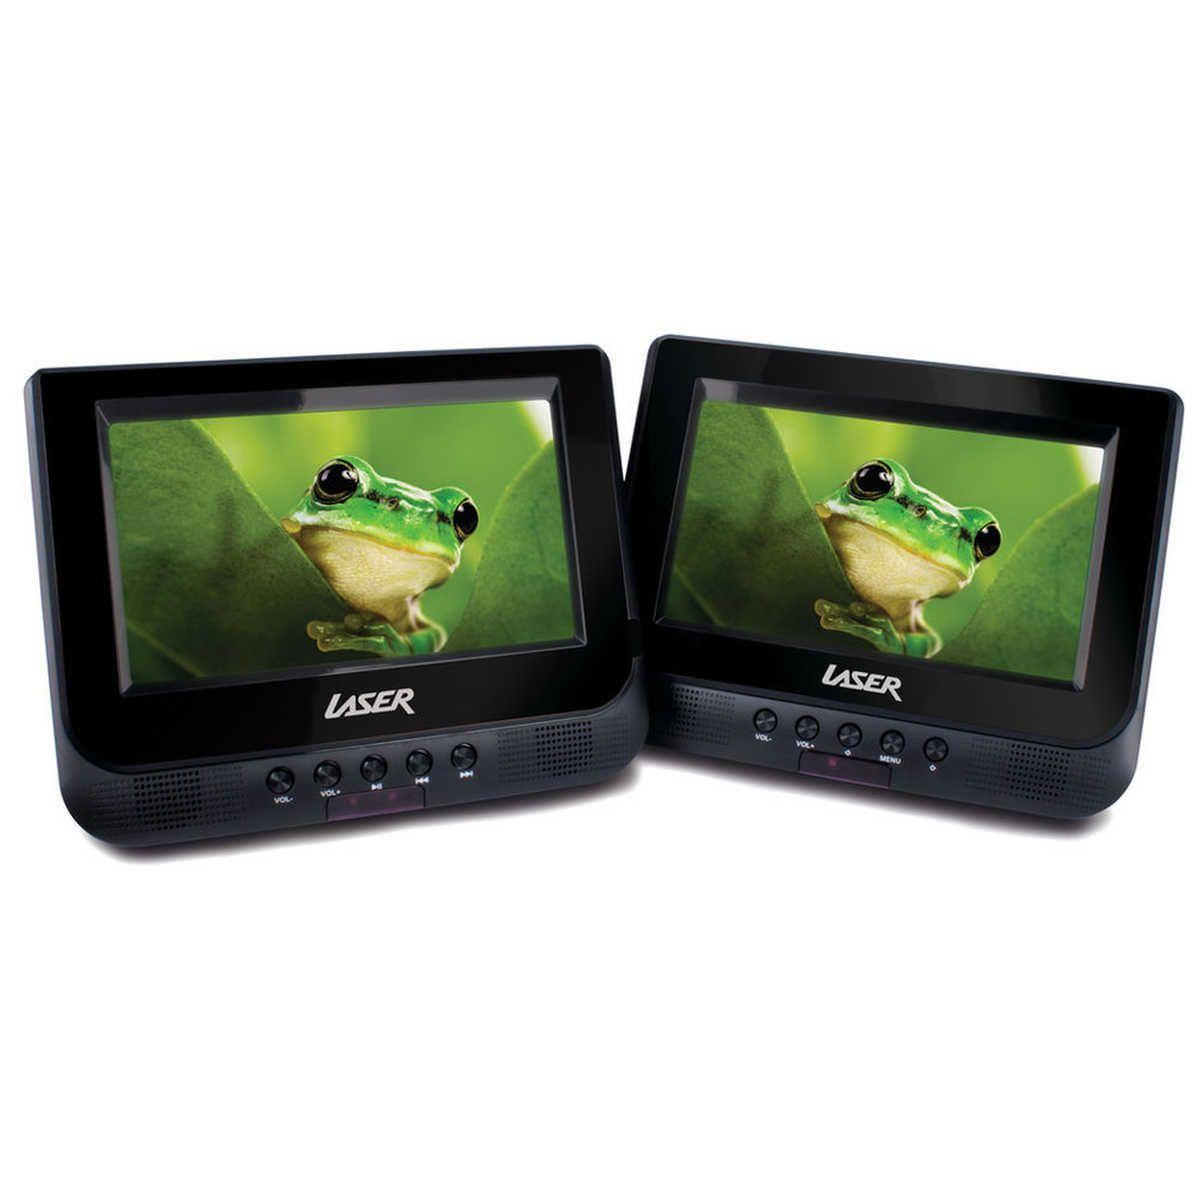 Laser Dual In Car Dvd Player 7 Lcd Big W Portable Dvd